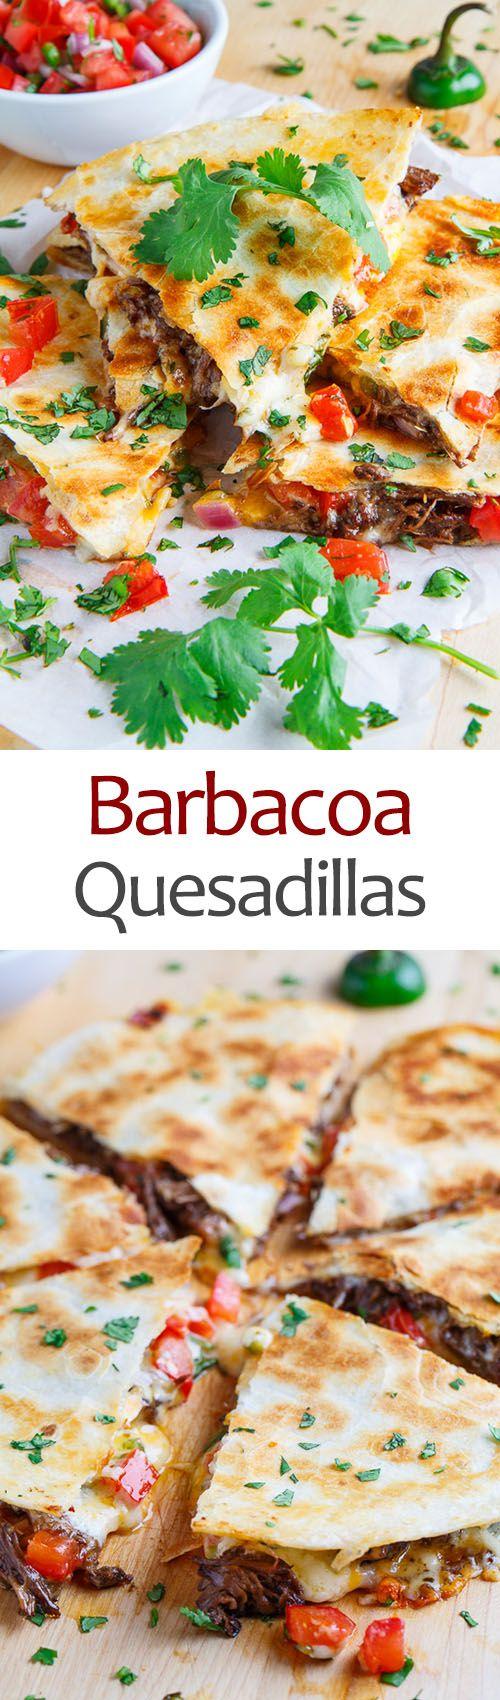 Barbacoa Quesadillas